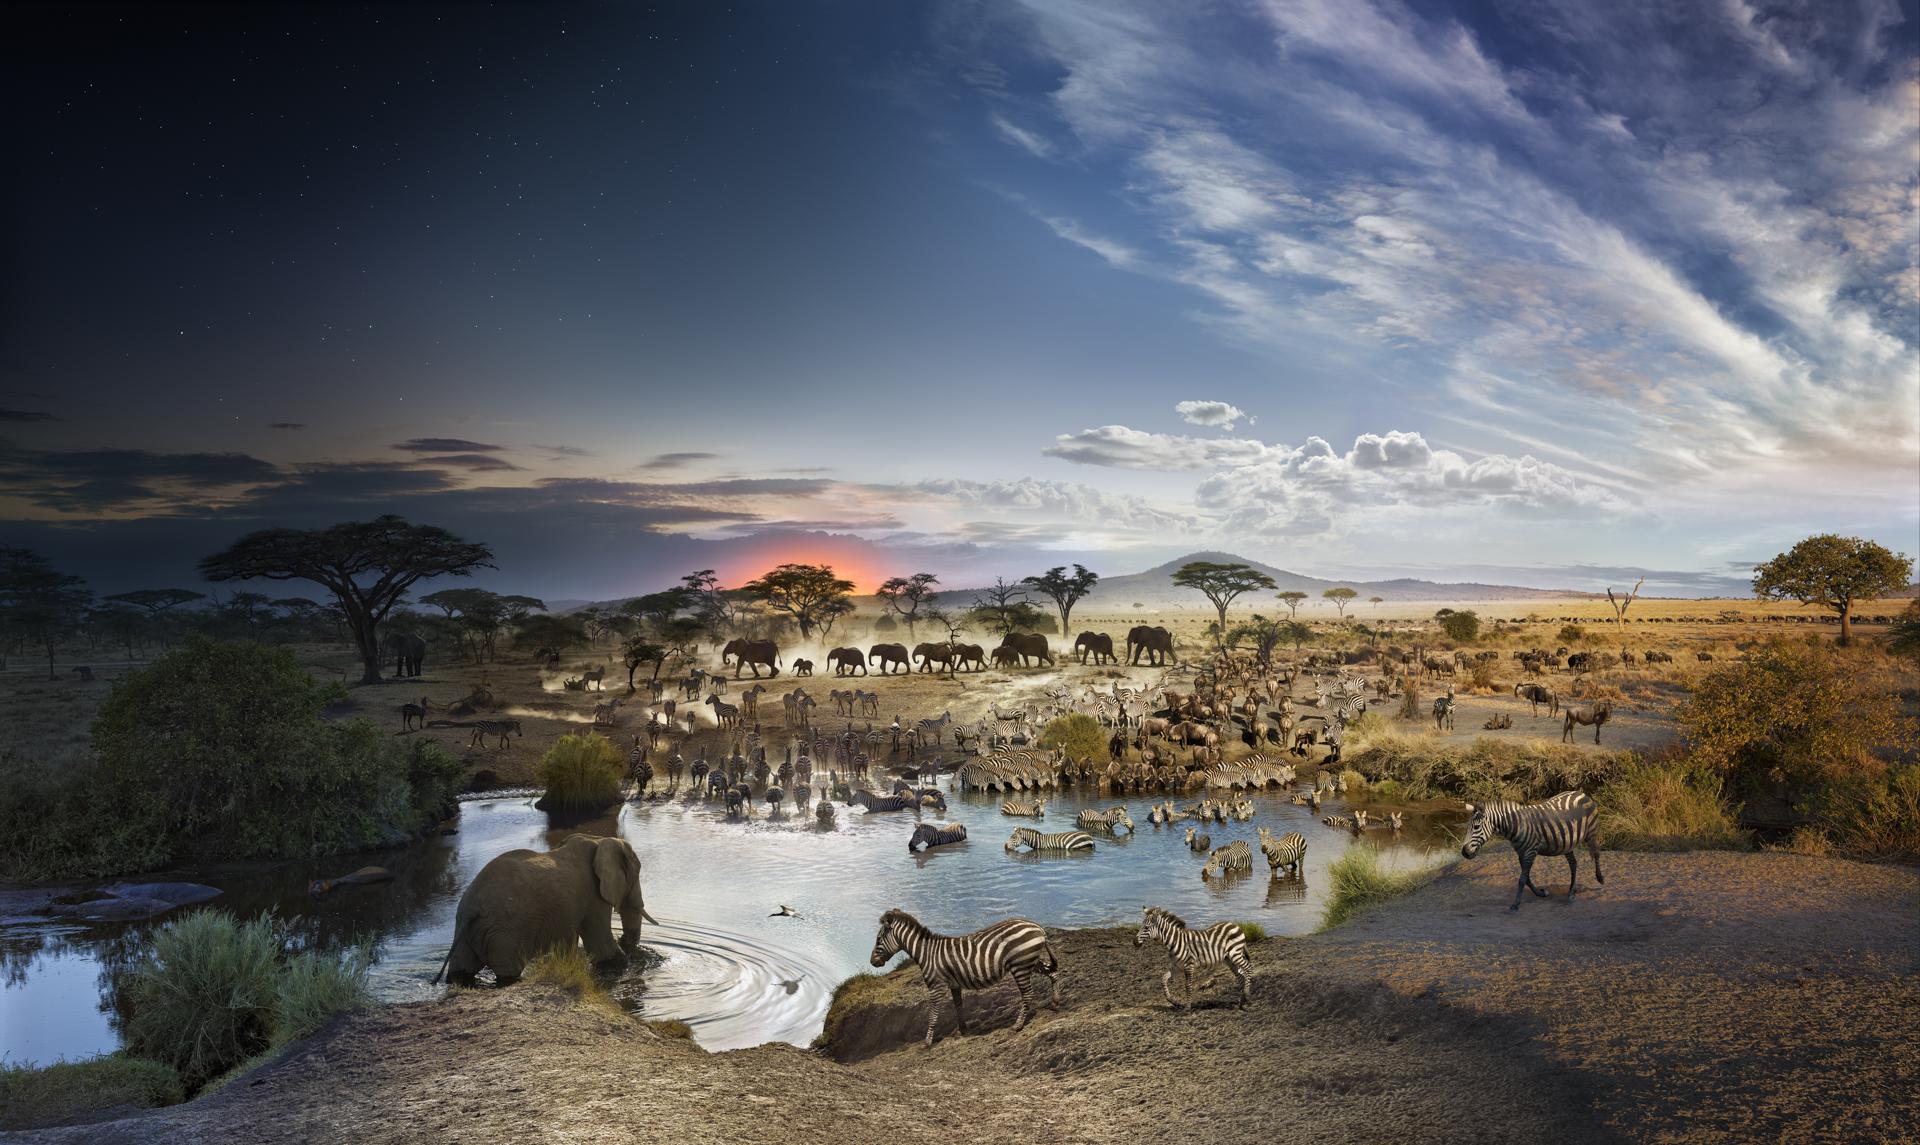 Serengeti National Park, Tanzania, Day to Night, 2015